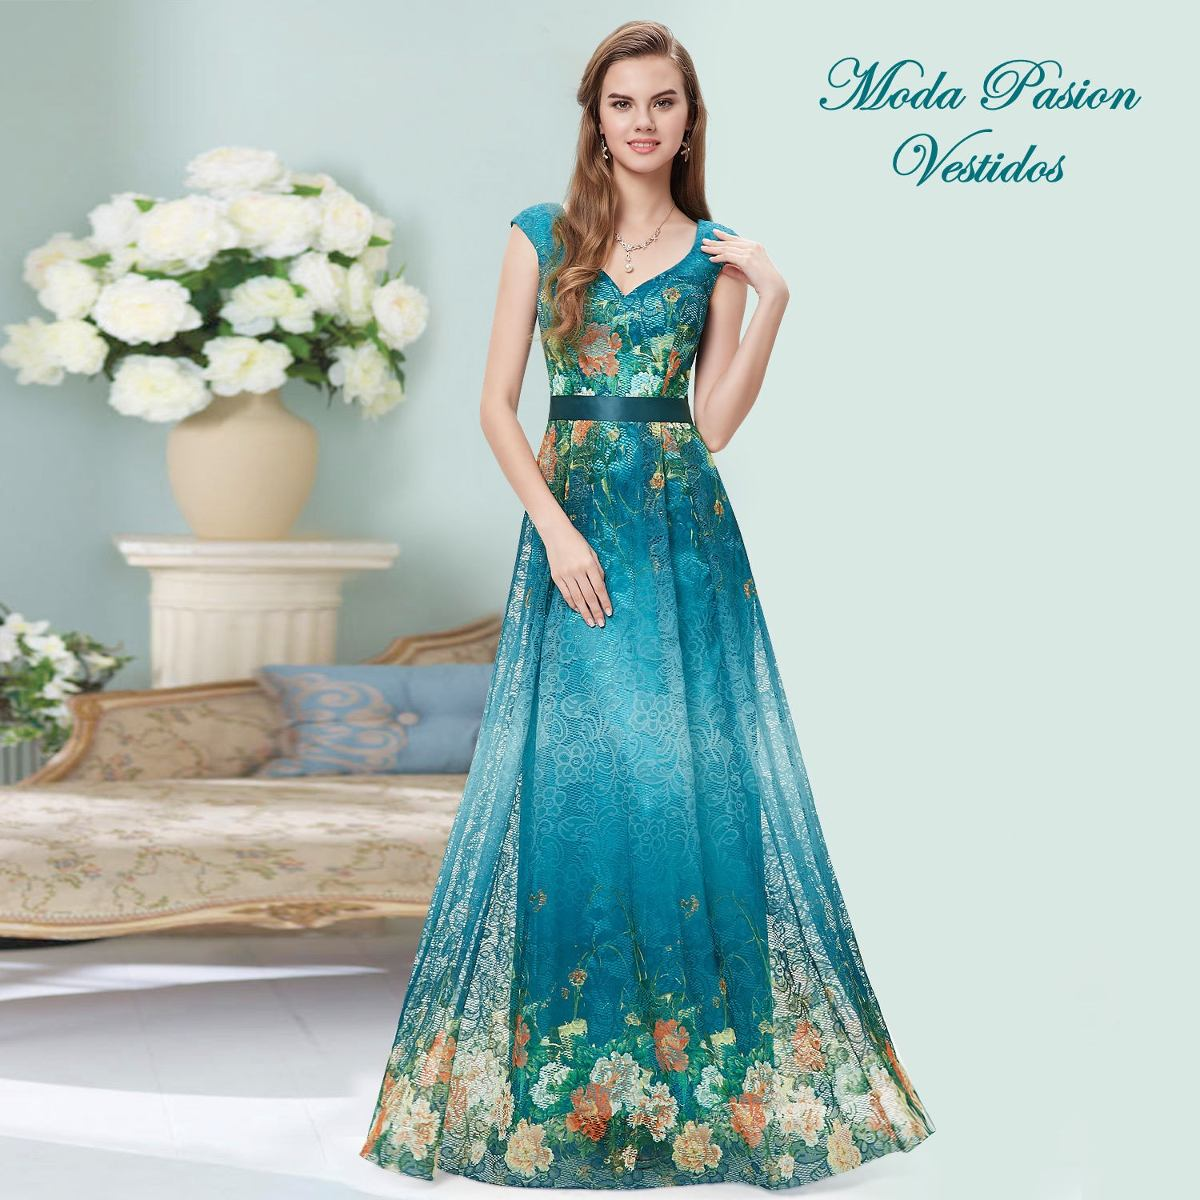 Vestidos estampados largos – Moda Española moderna 2018